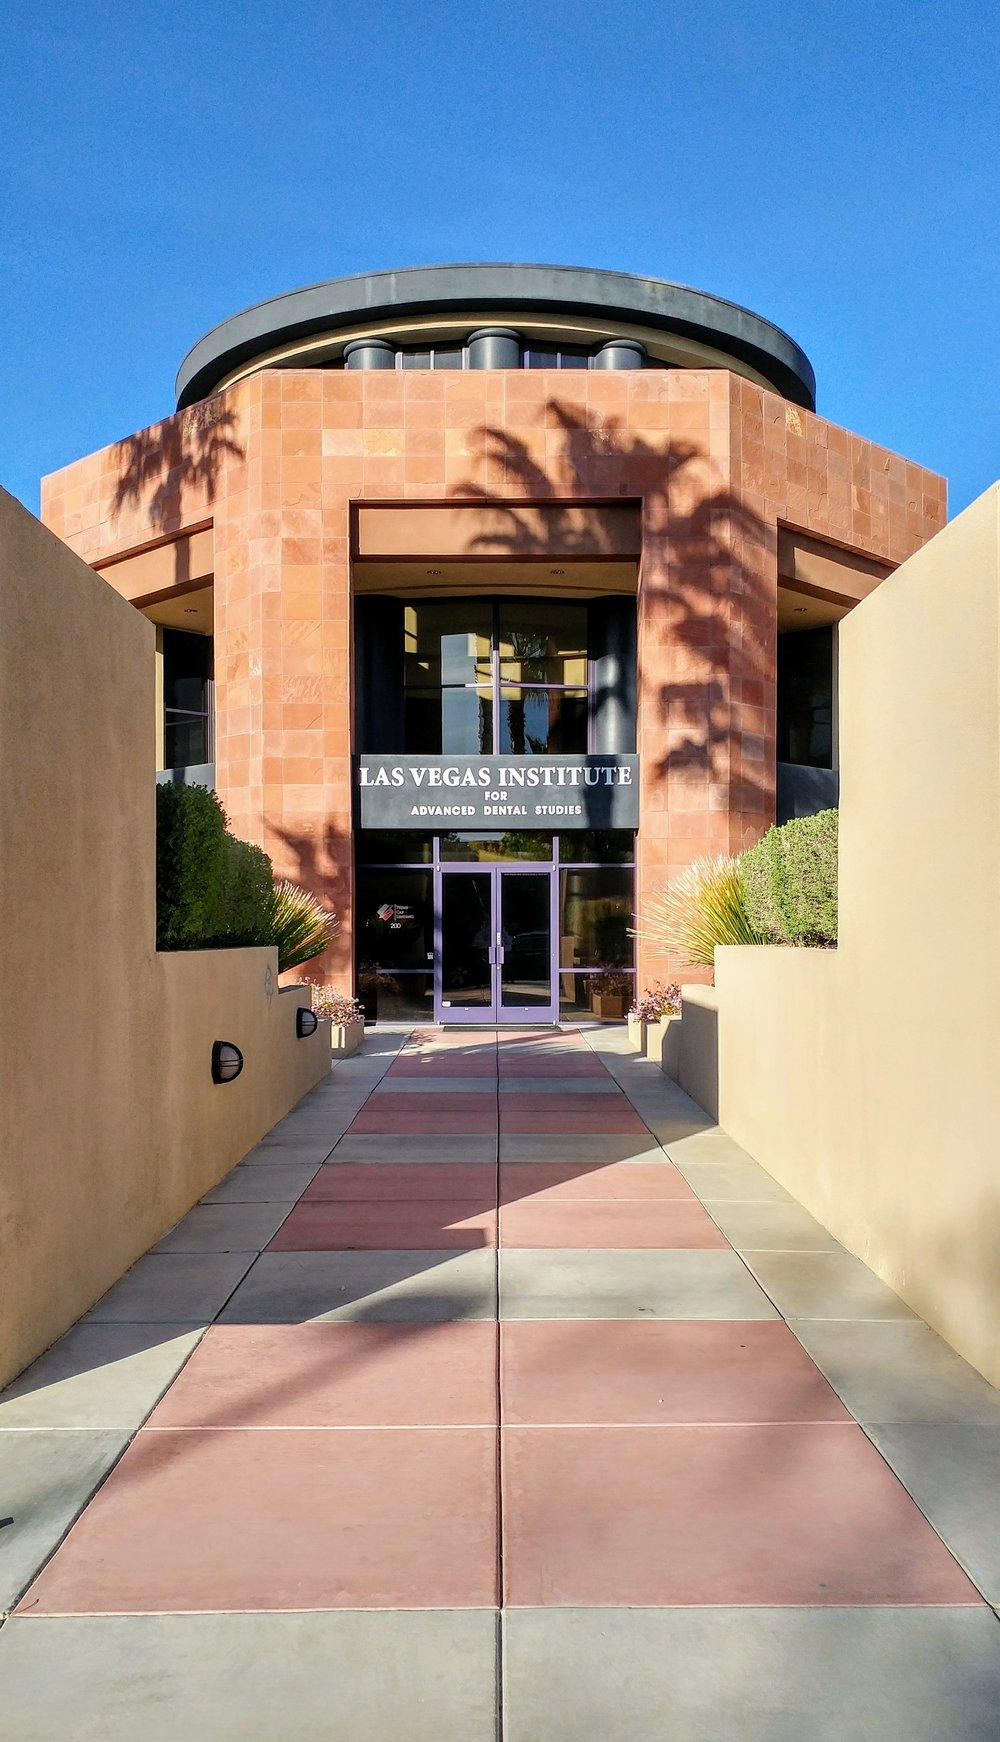 LVI Fellow Dr. Randi Green at the Las Vegas Institute, for Advanced Dental Studies on a Spring day before advanced training begins.